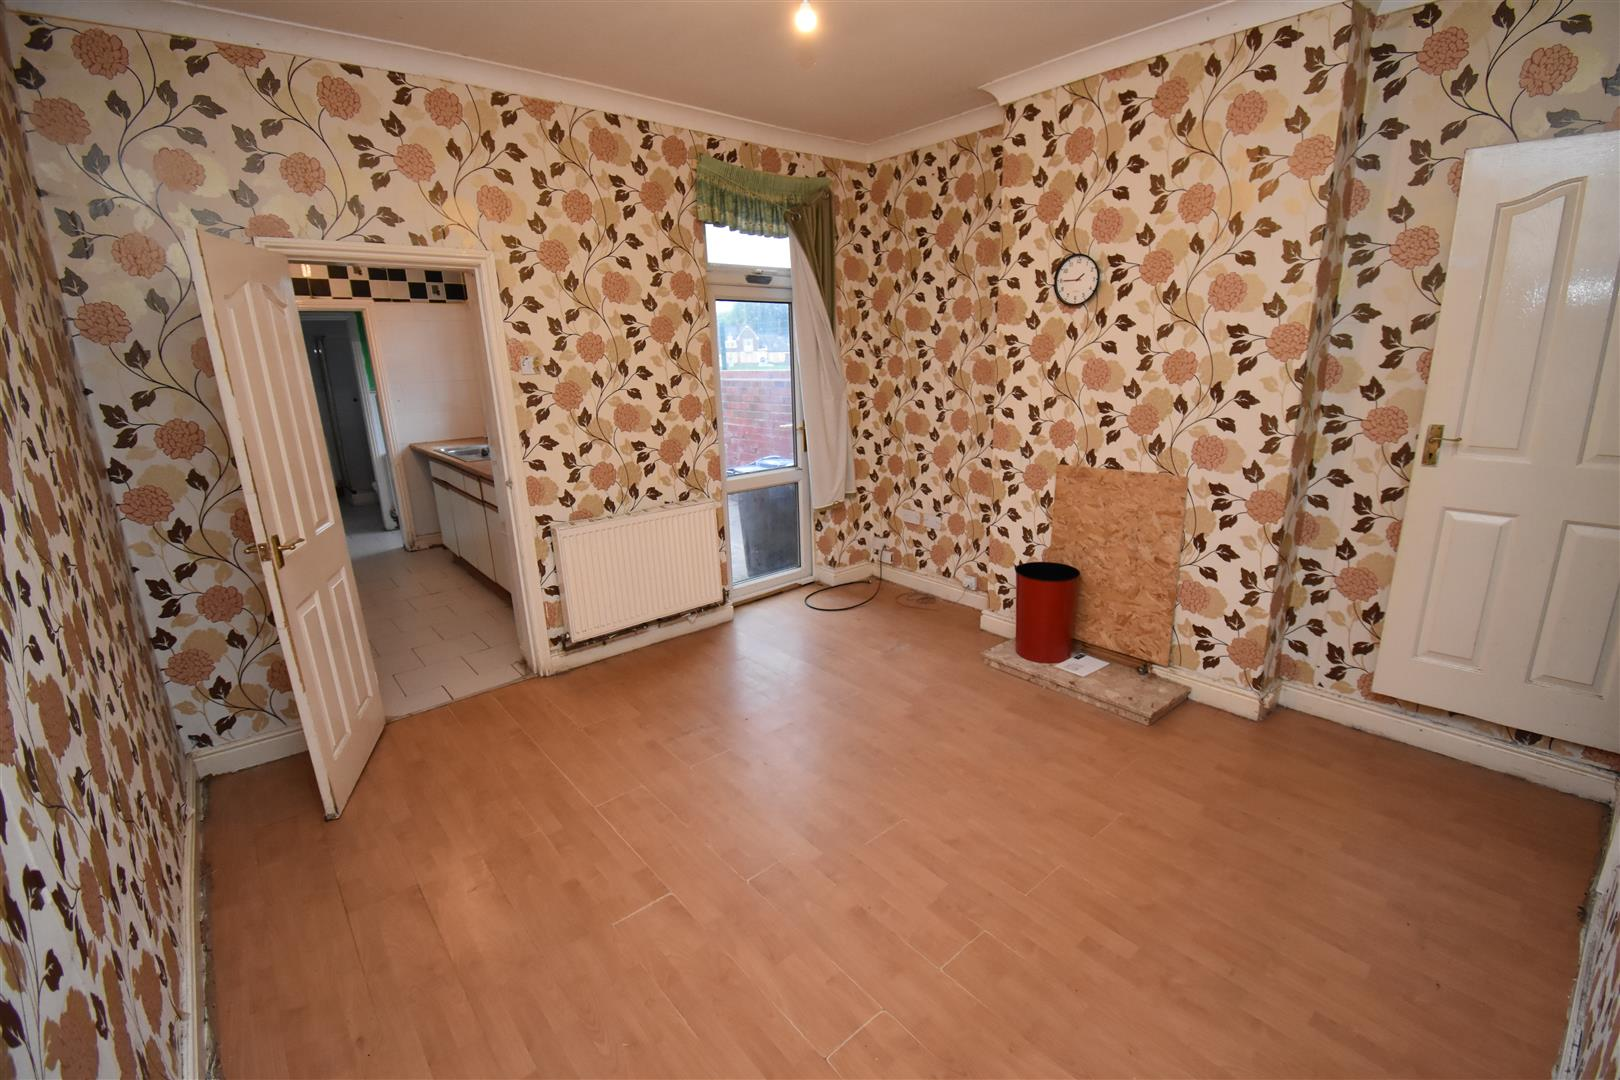 3 bed  for sale in Alderson Road, Alum Rock, Birmingham 3